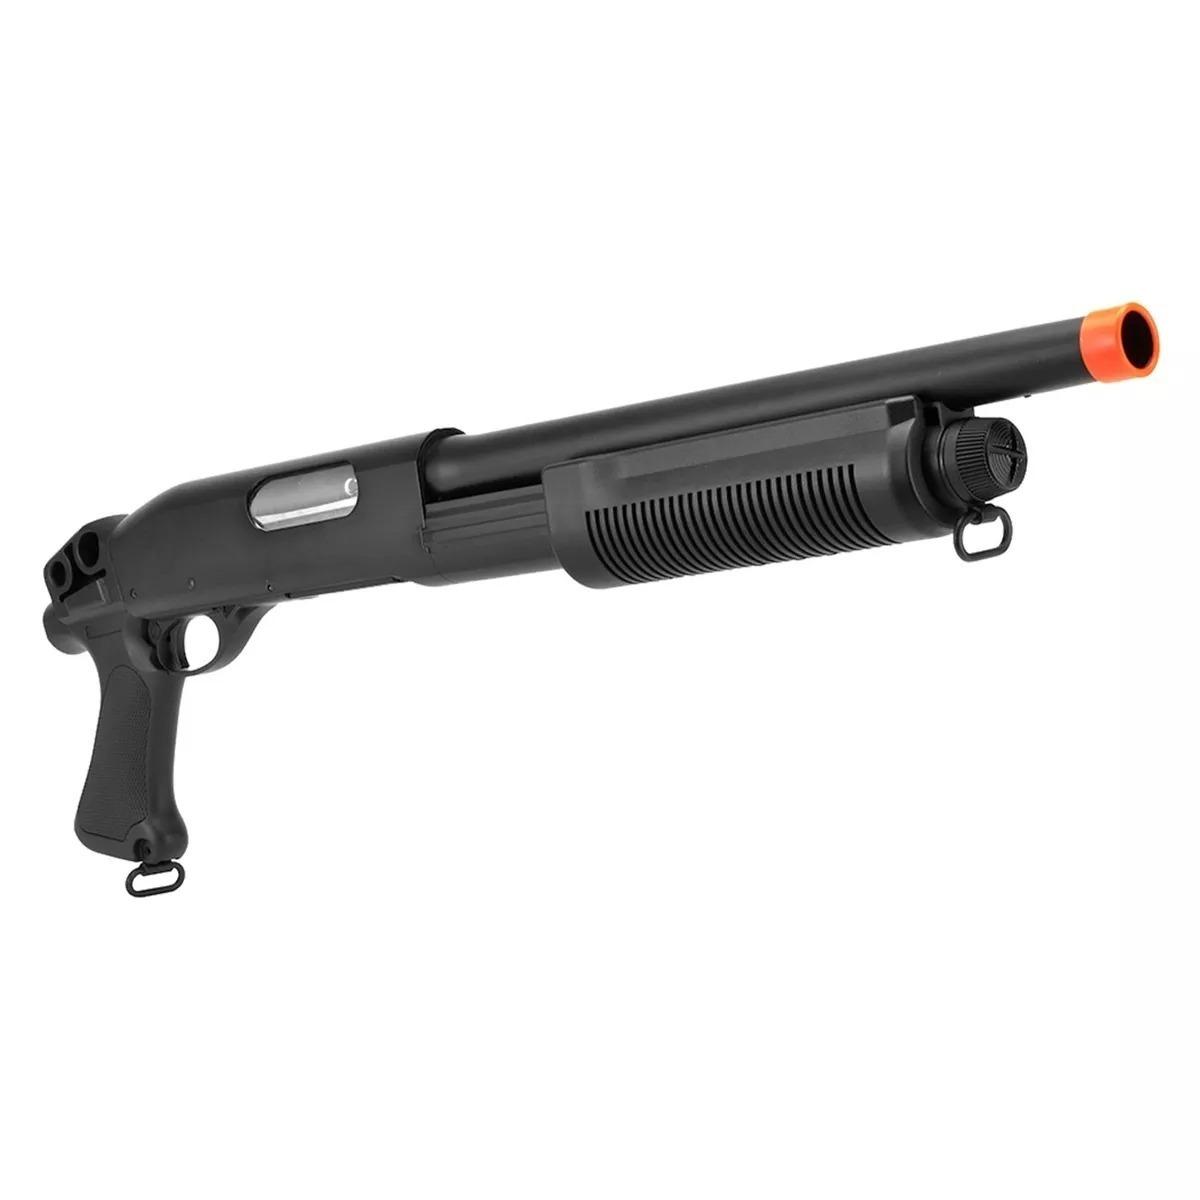 Shotgun Airsoft Cyma Cm351 Modelo M870 Metal Calibre 12